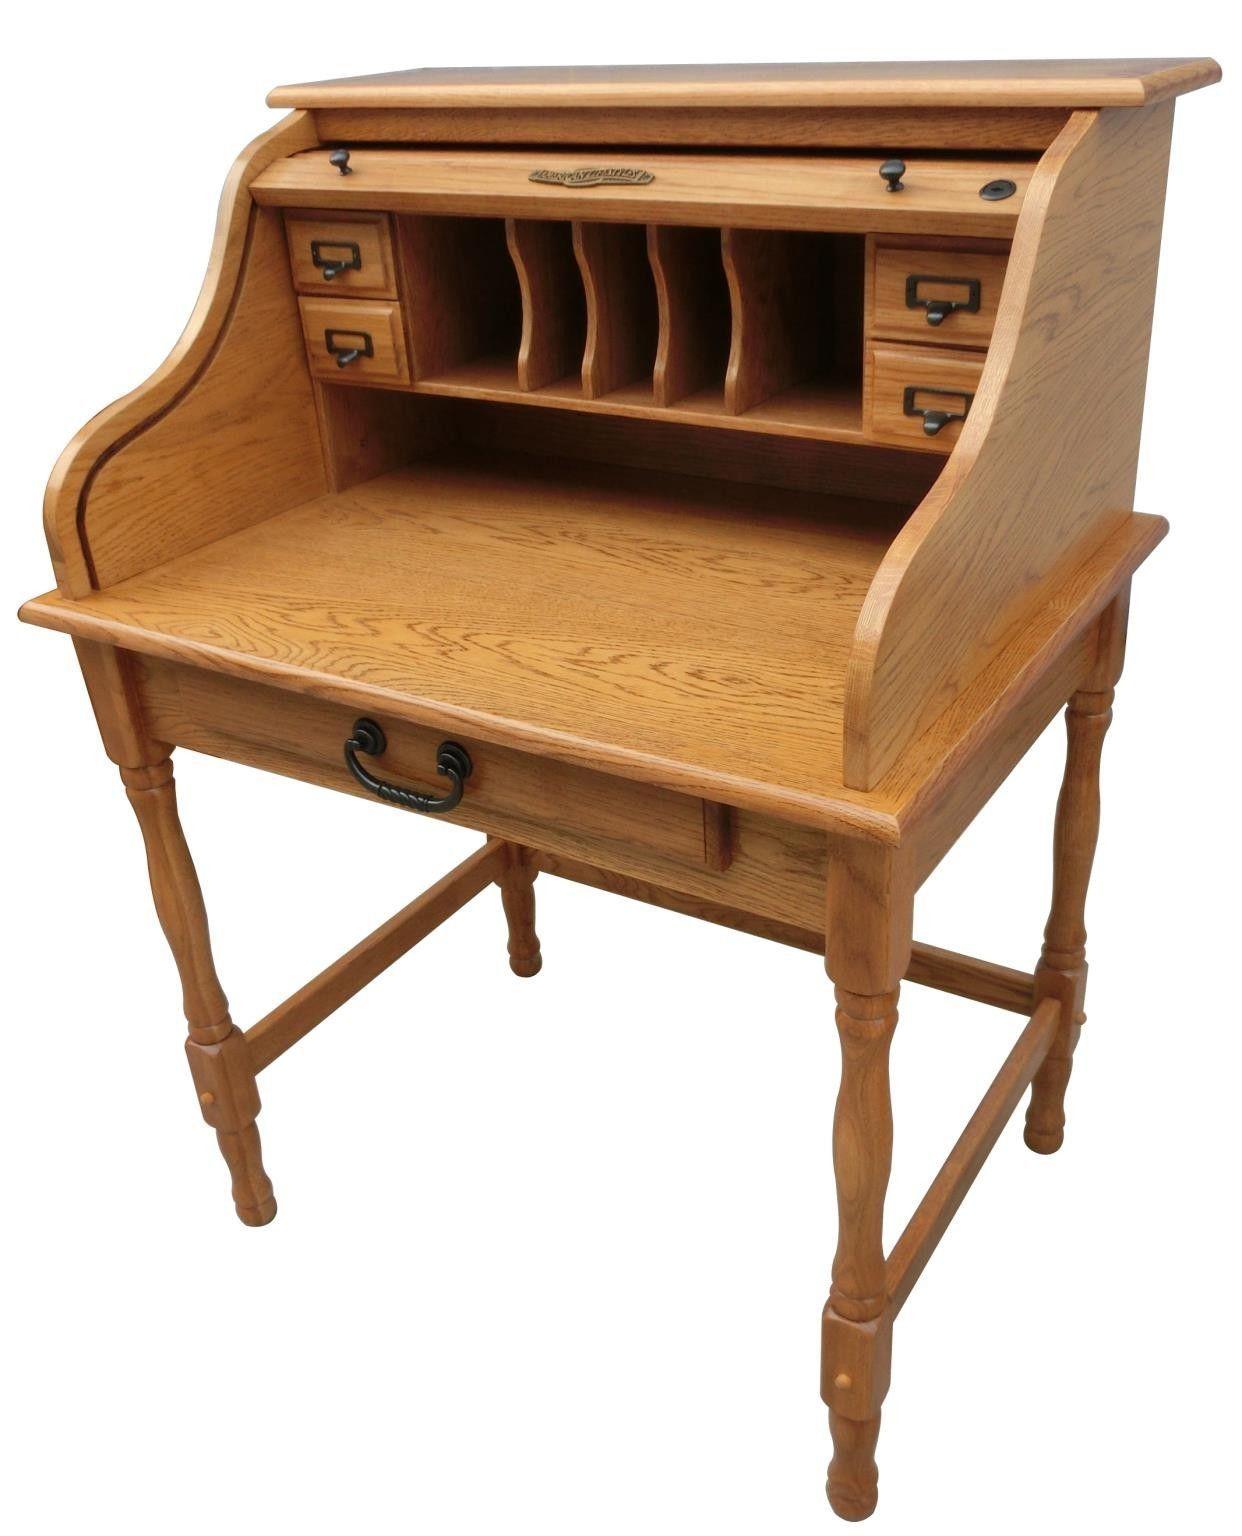 Lonie Roll Top Secretary Desk In 2020 Chelsea Home Furniture Secretary Desks Roll Top Desk